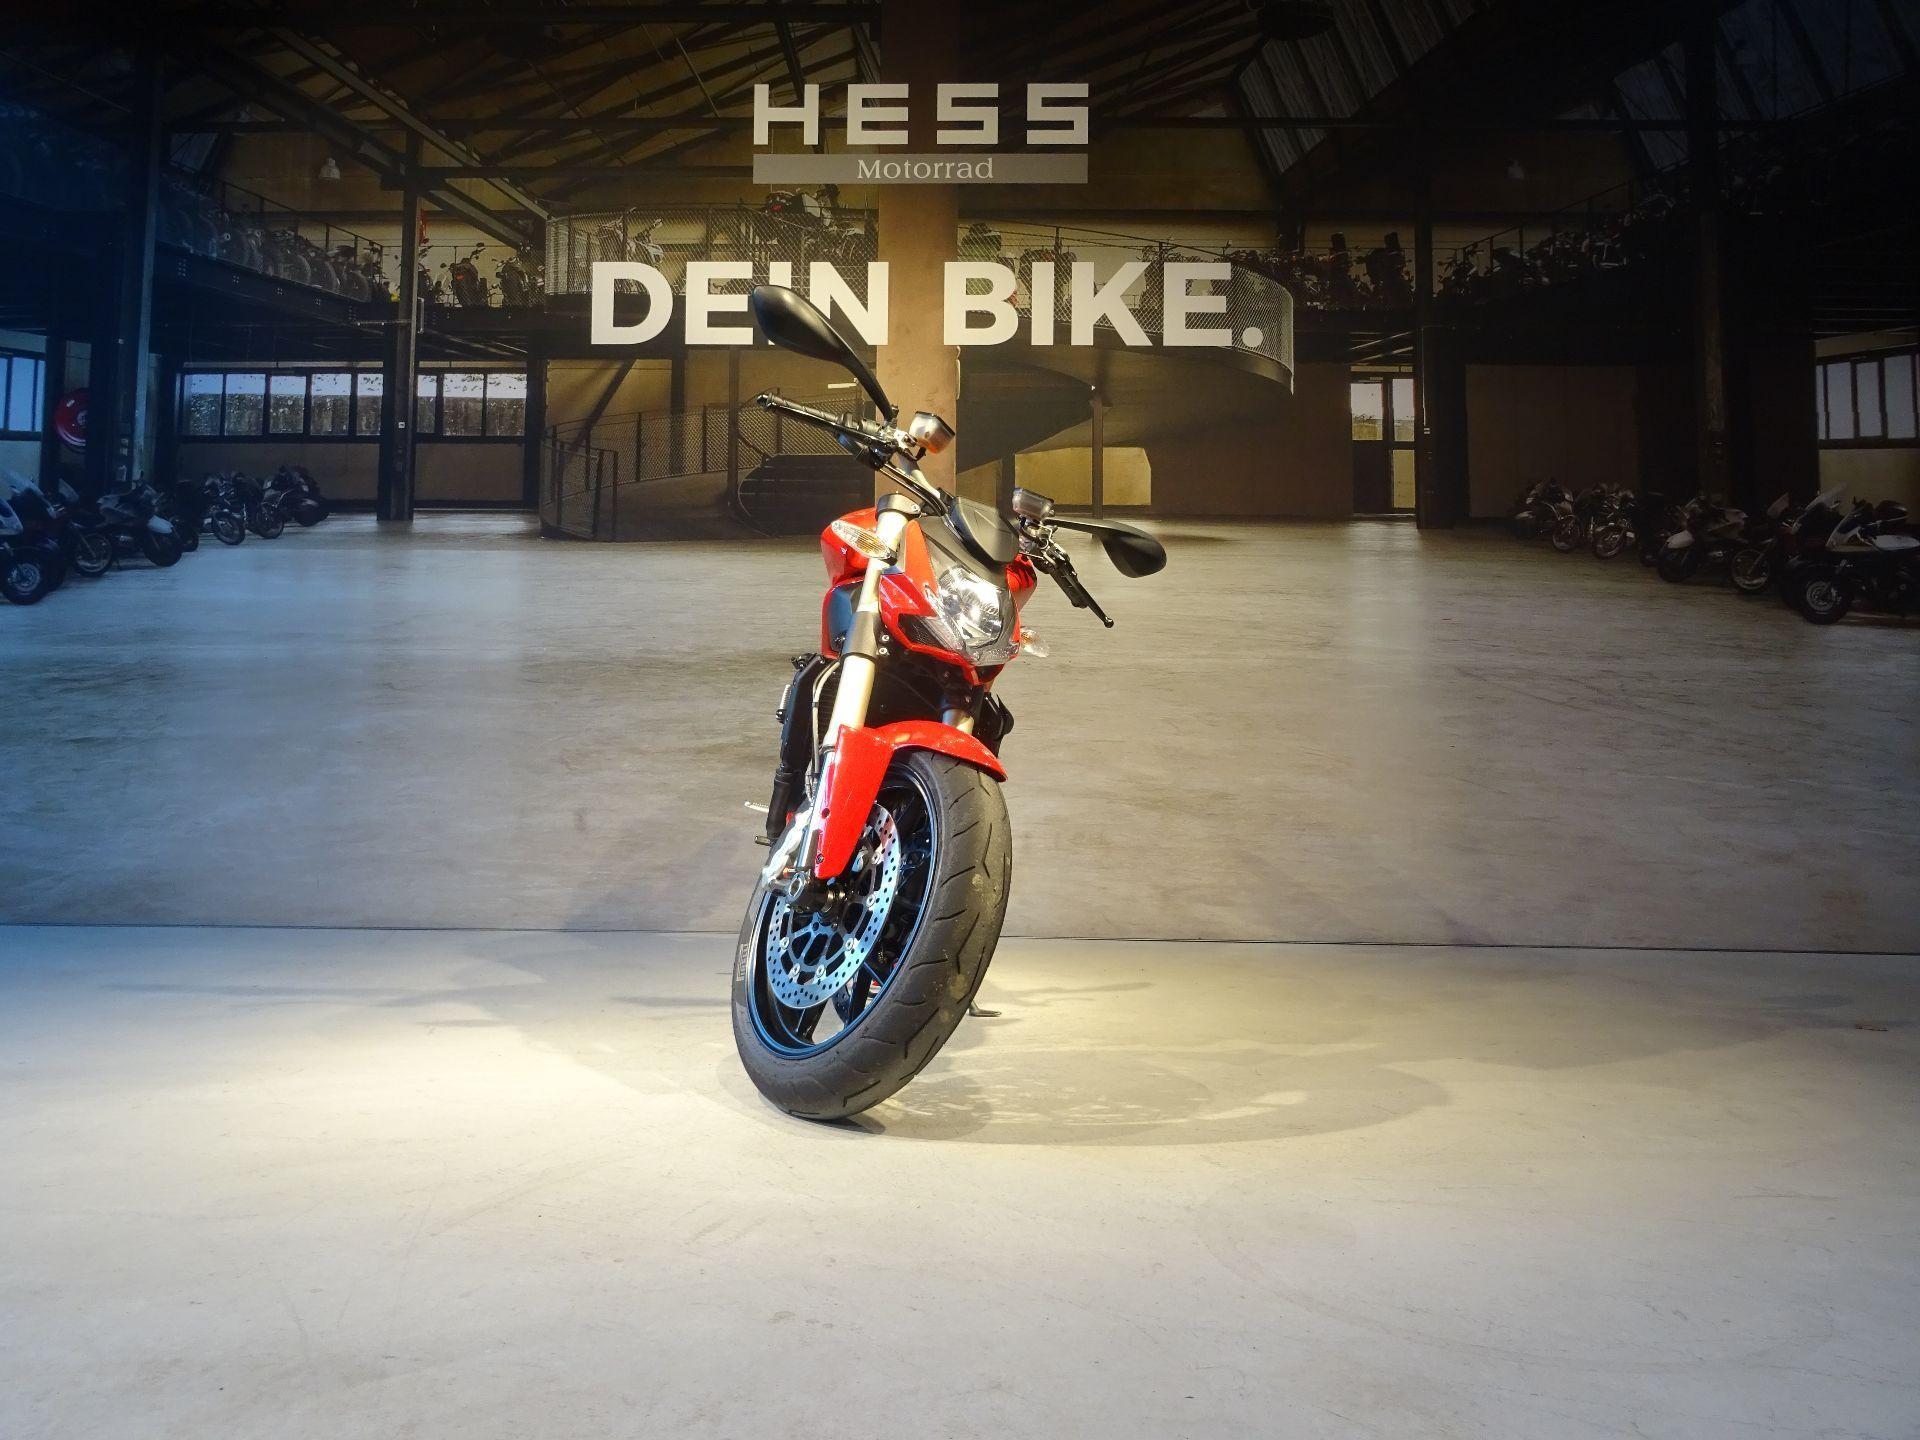 moto occasions acheter ducati 848 streetfighter hess motorrad stettlen. Black Bedroom Furniture Sets. Home Design Ideas